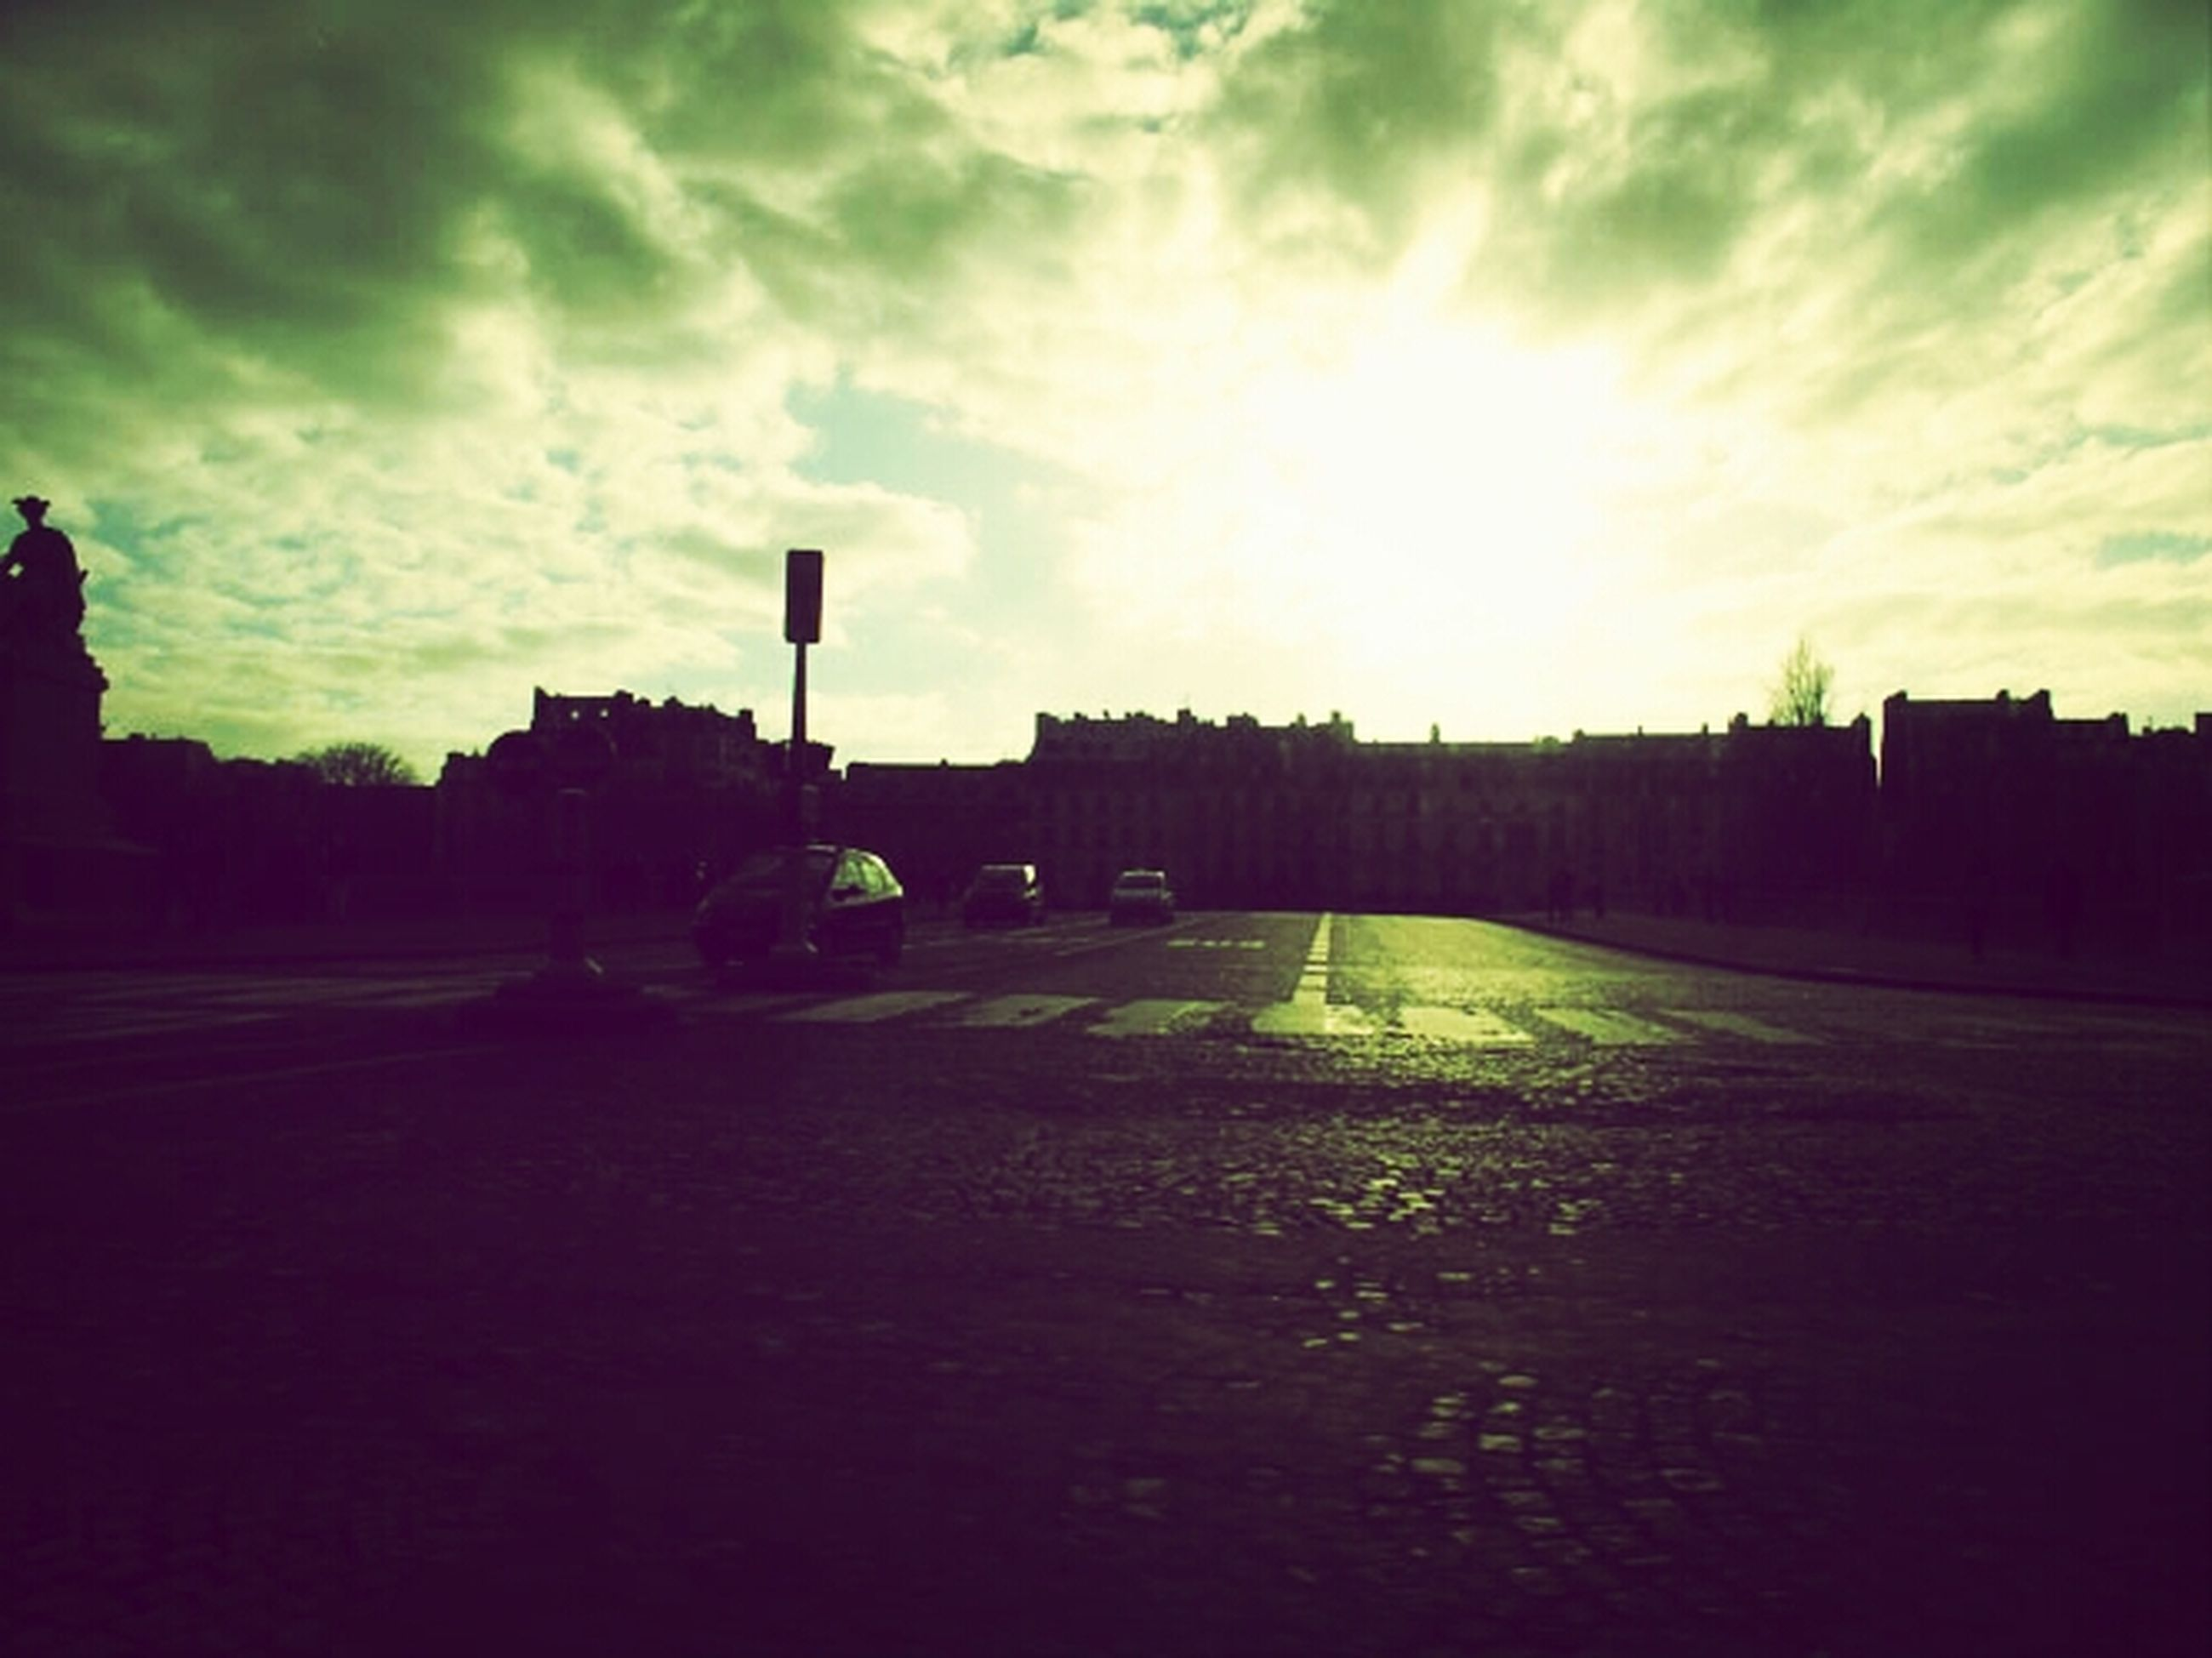 sunset, sky, silhouette, road, transportation, cloud - sky, street, sunlight, sun, the way forward, cloud, car, built structure, building exterior, architecture, sunbeam, street light, cloudy, land vehicle, outdoors